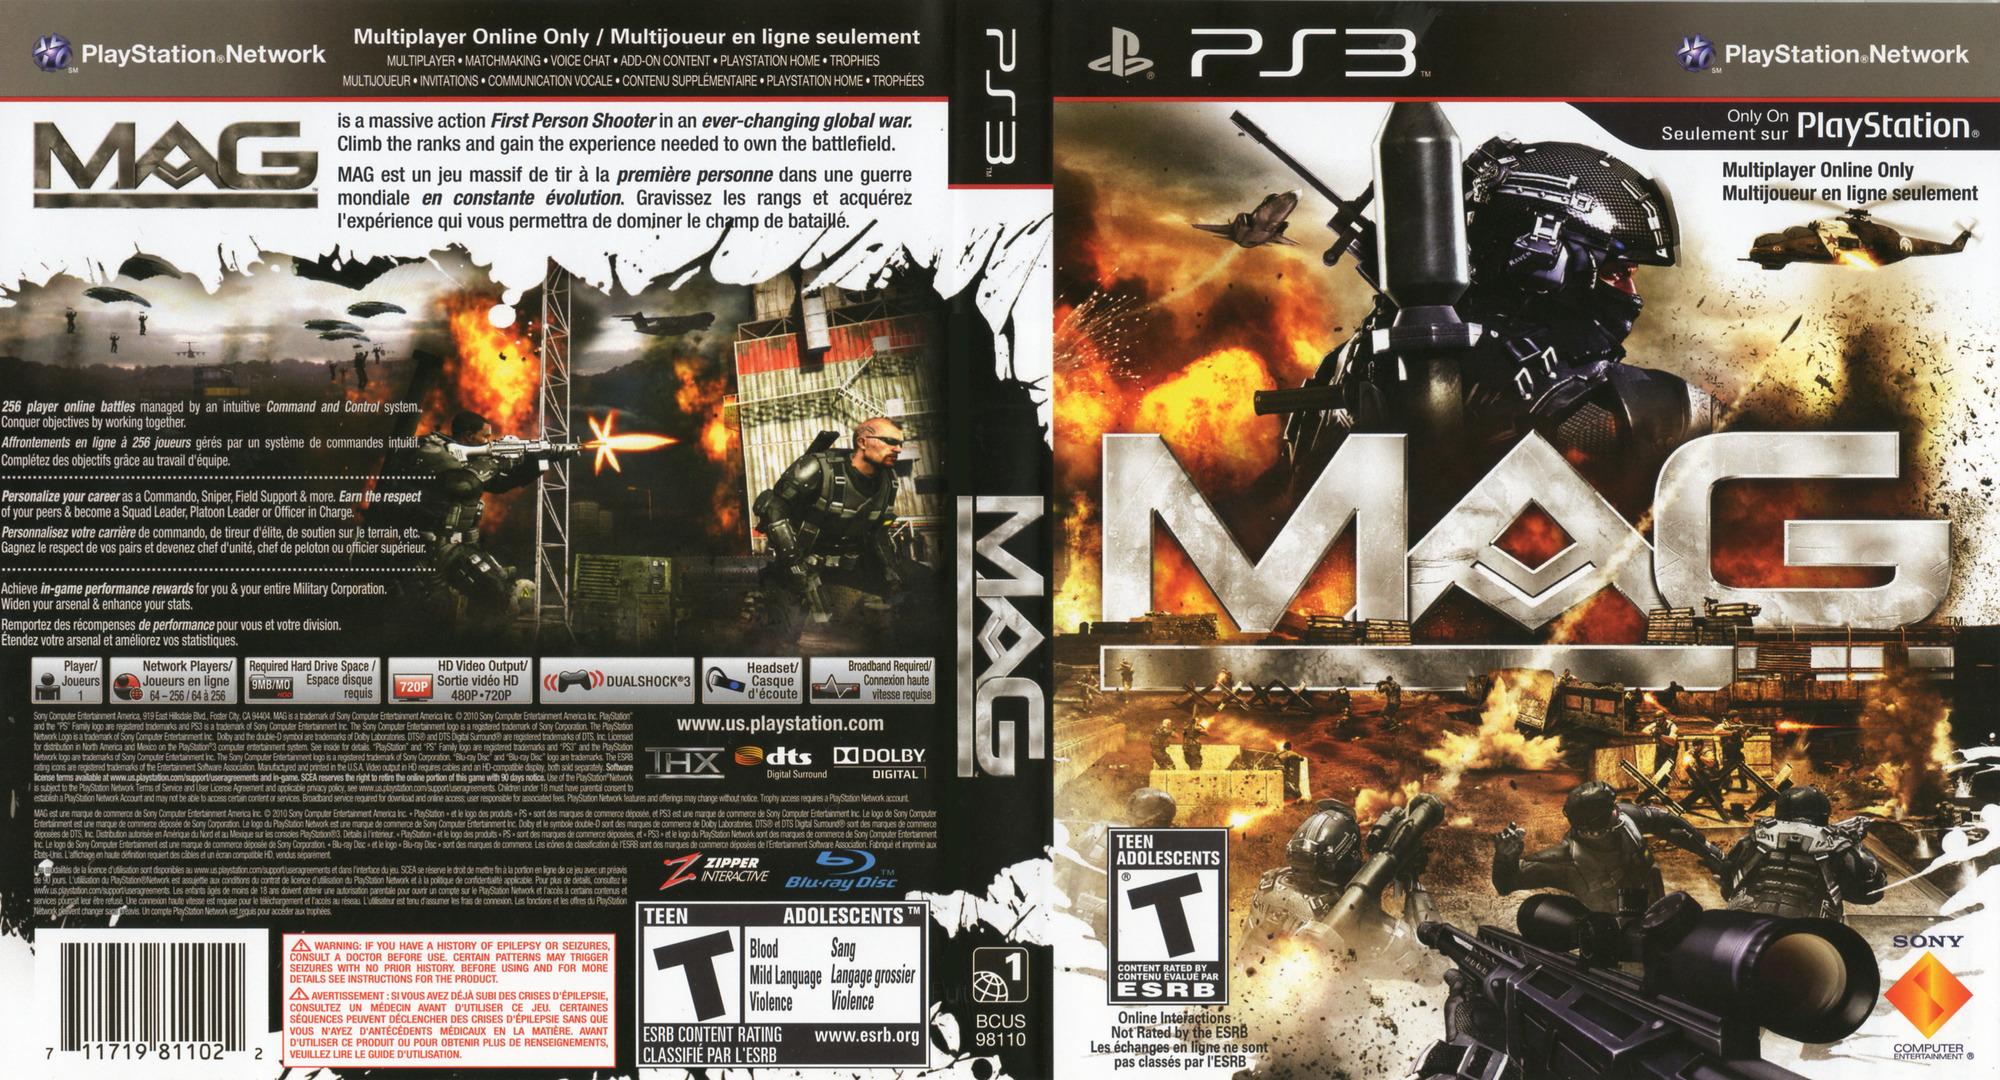 MAG PS3 coverfullHQ2 (BCUS98110)